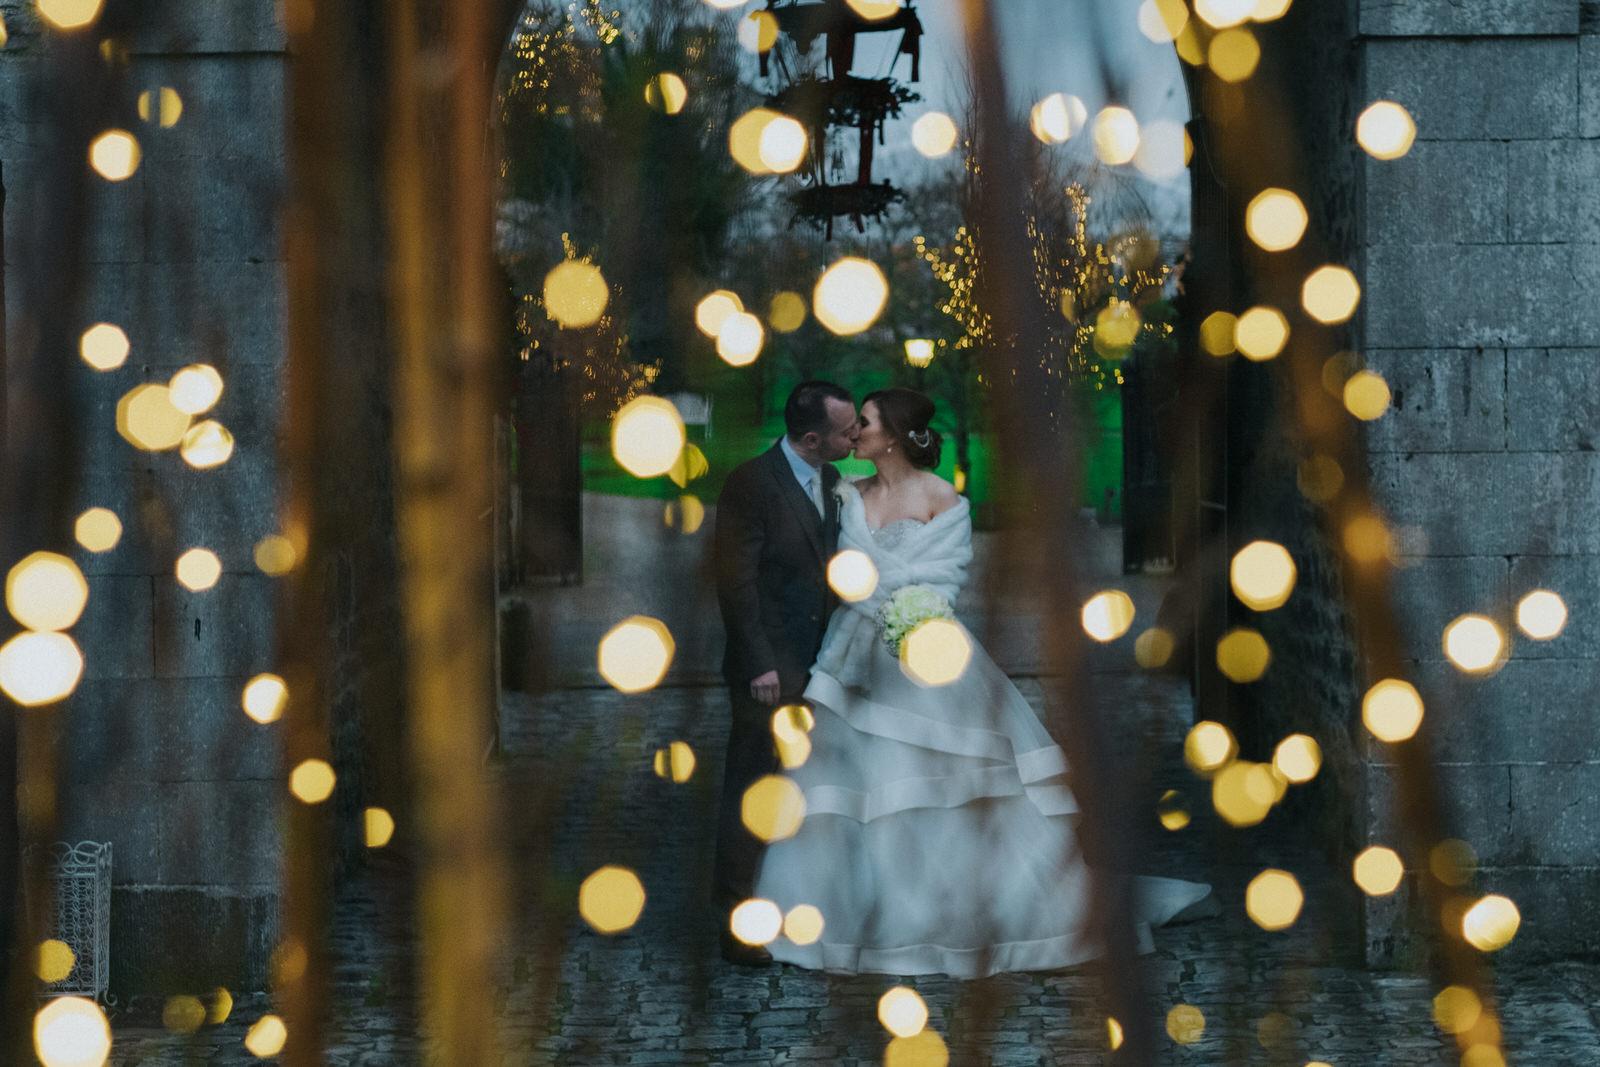 Clonabreany_wedding-photographer_roger_kenny_ireland_076.jpg